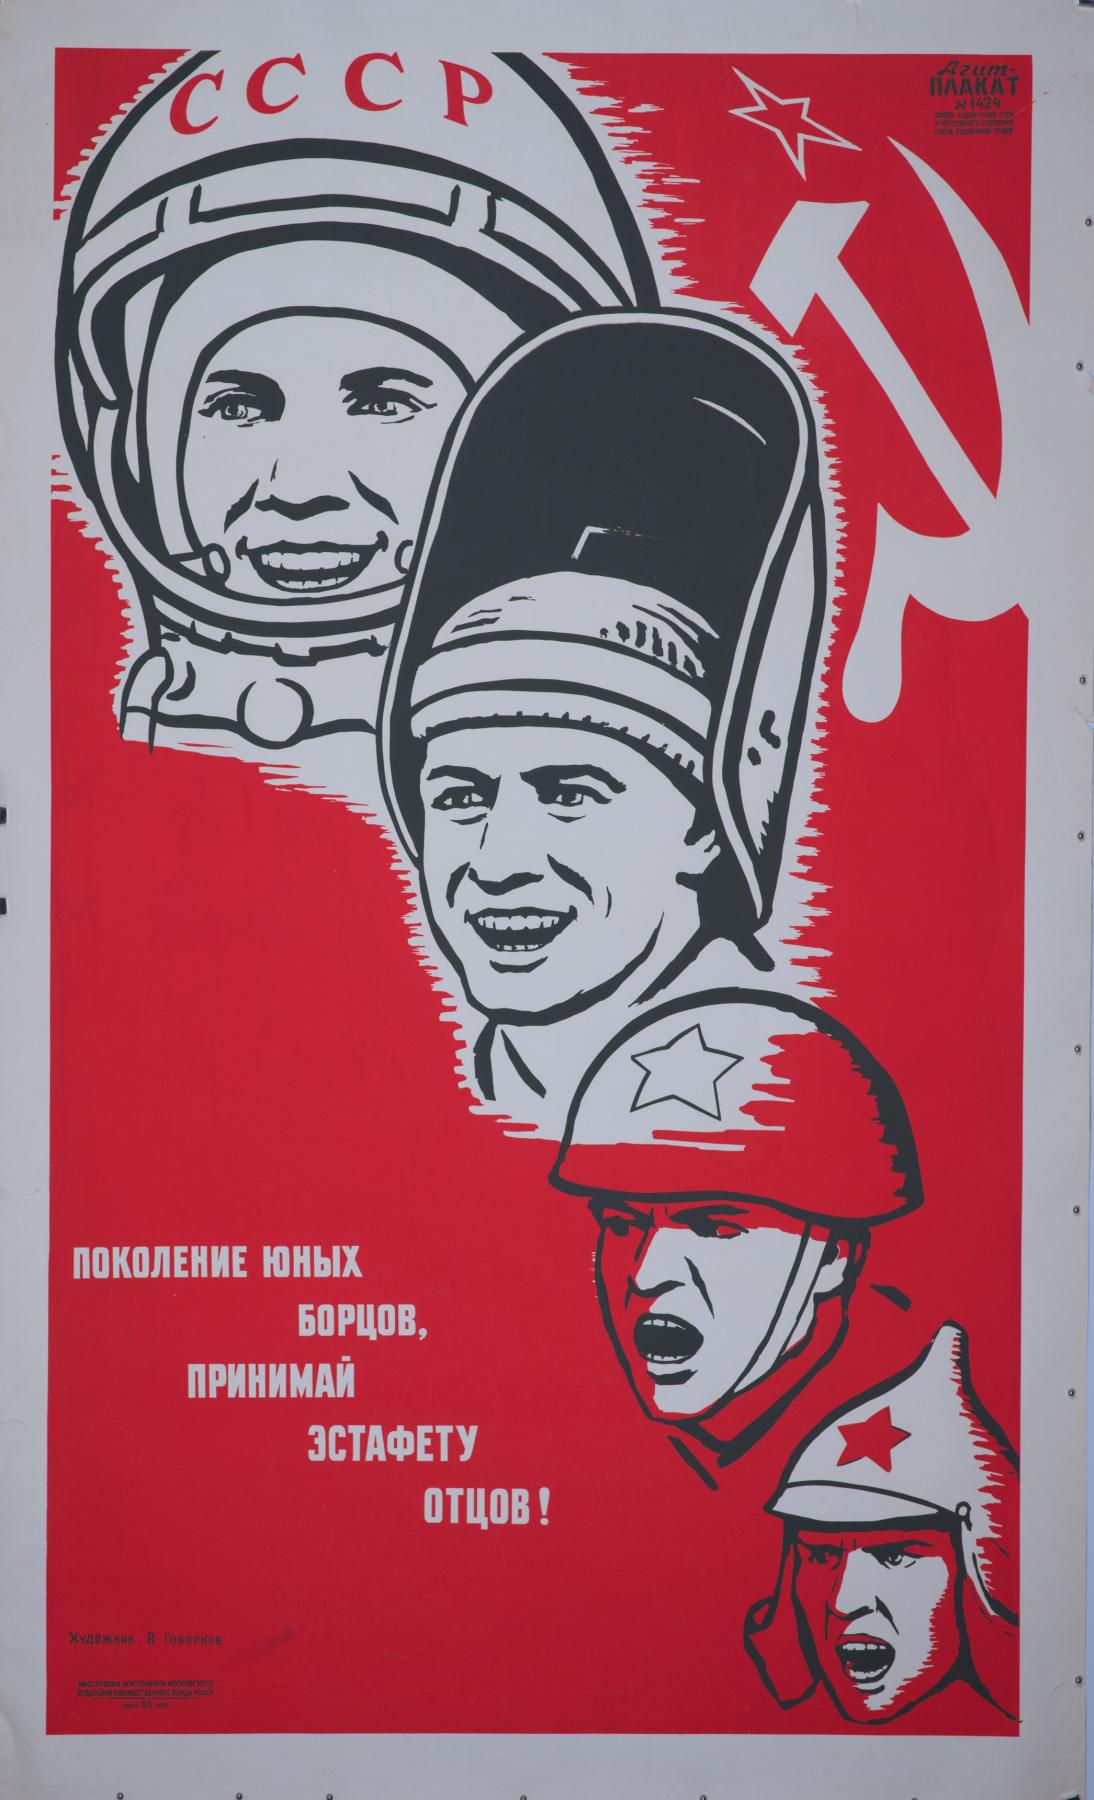 Victor Ivanovich Govorkov. Pass the baton of the fathers! The poster No. 1424